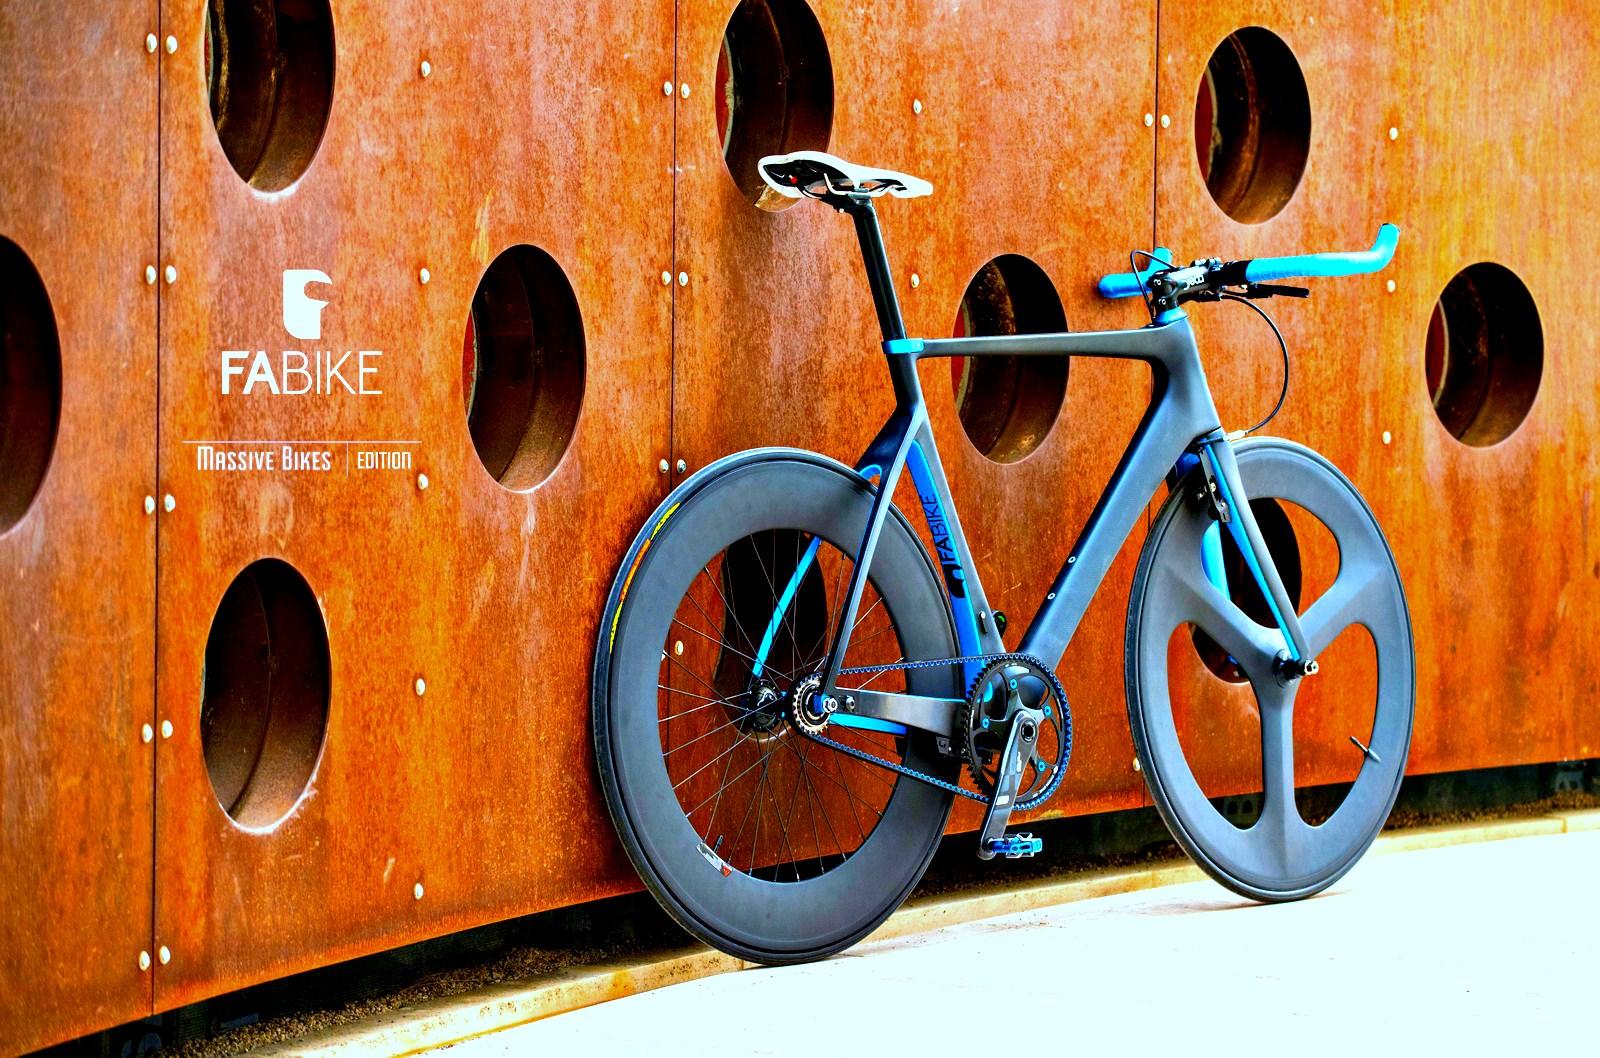 Fabike-Massivebikes-Singlespeed-Edition-12